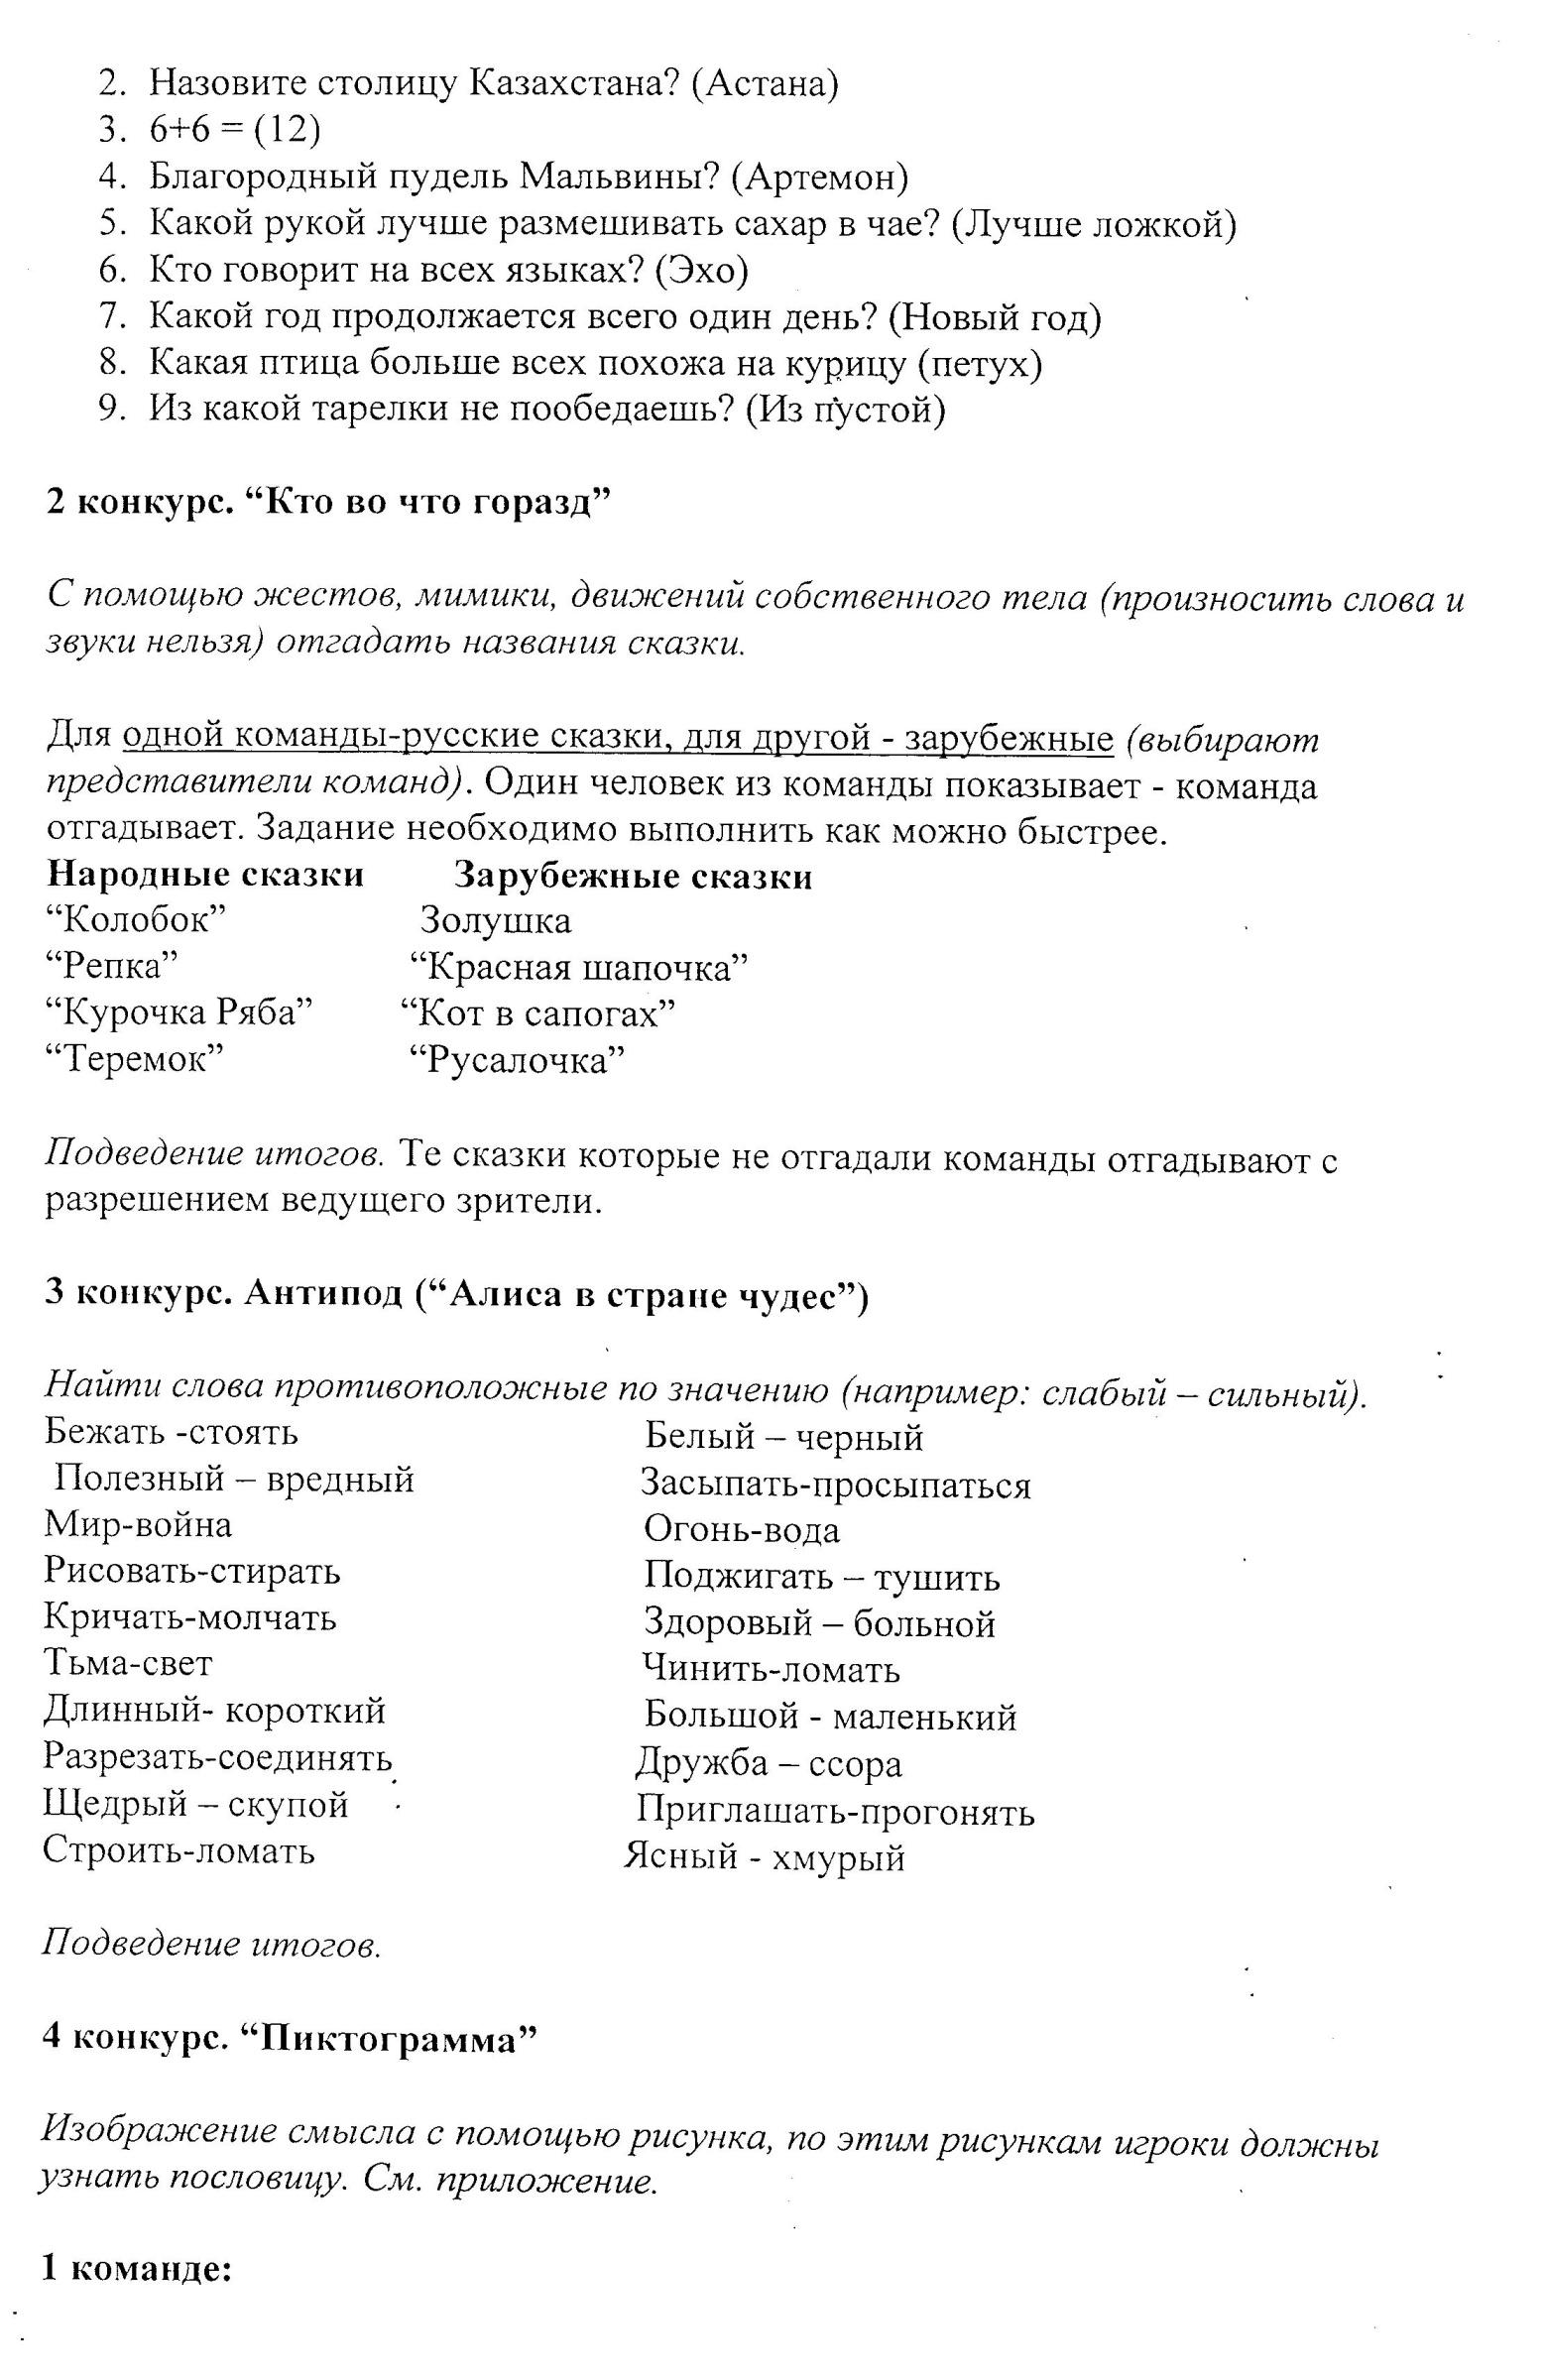 C:\Documents and Settings\оао\Рабочий стол\разработки отк меропр нач кл\угадайка\оля2.jpg